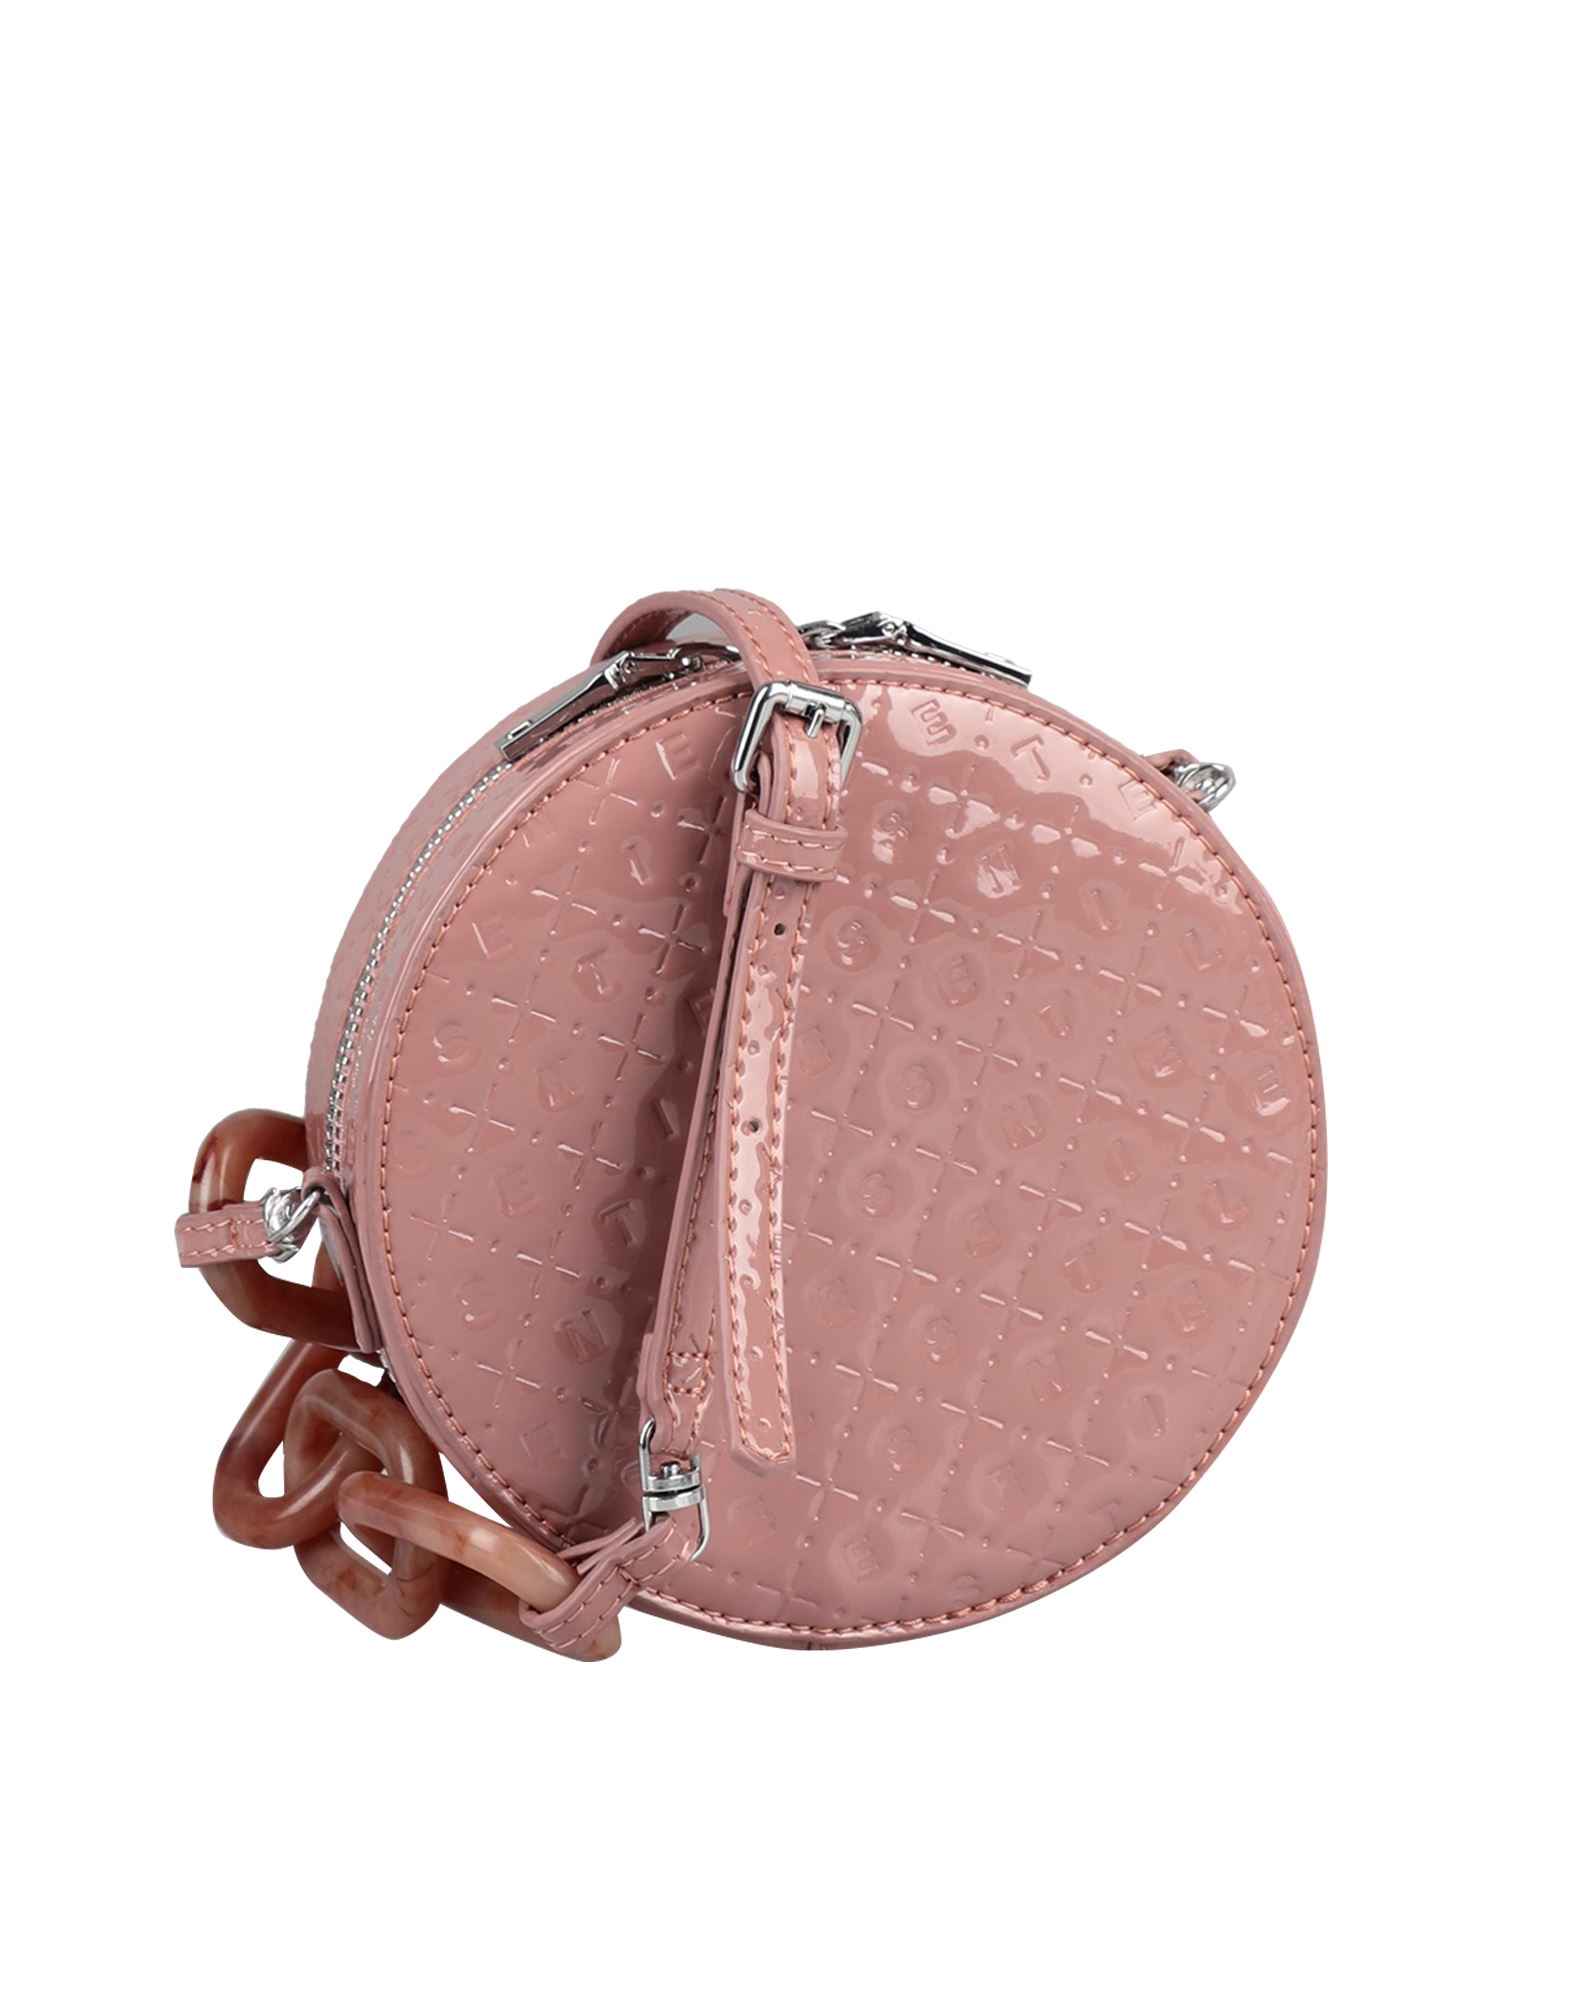 Фото - ESSENTIEL ANTWERP Сумка через плечо essentiel antwerp сумка на плечо